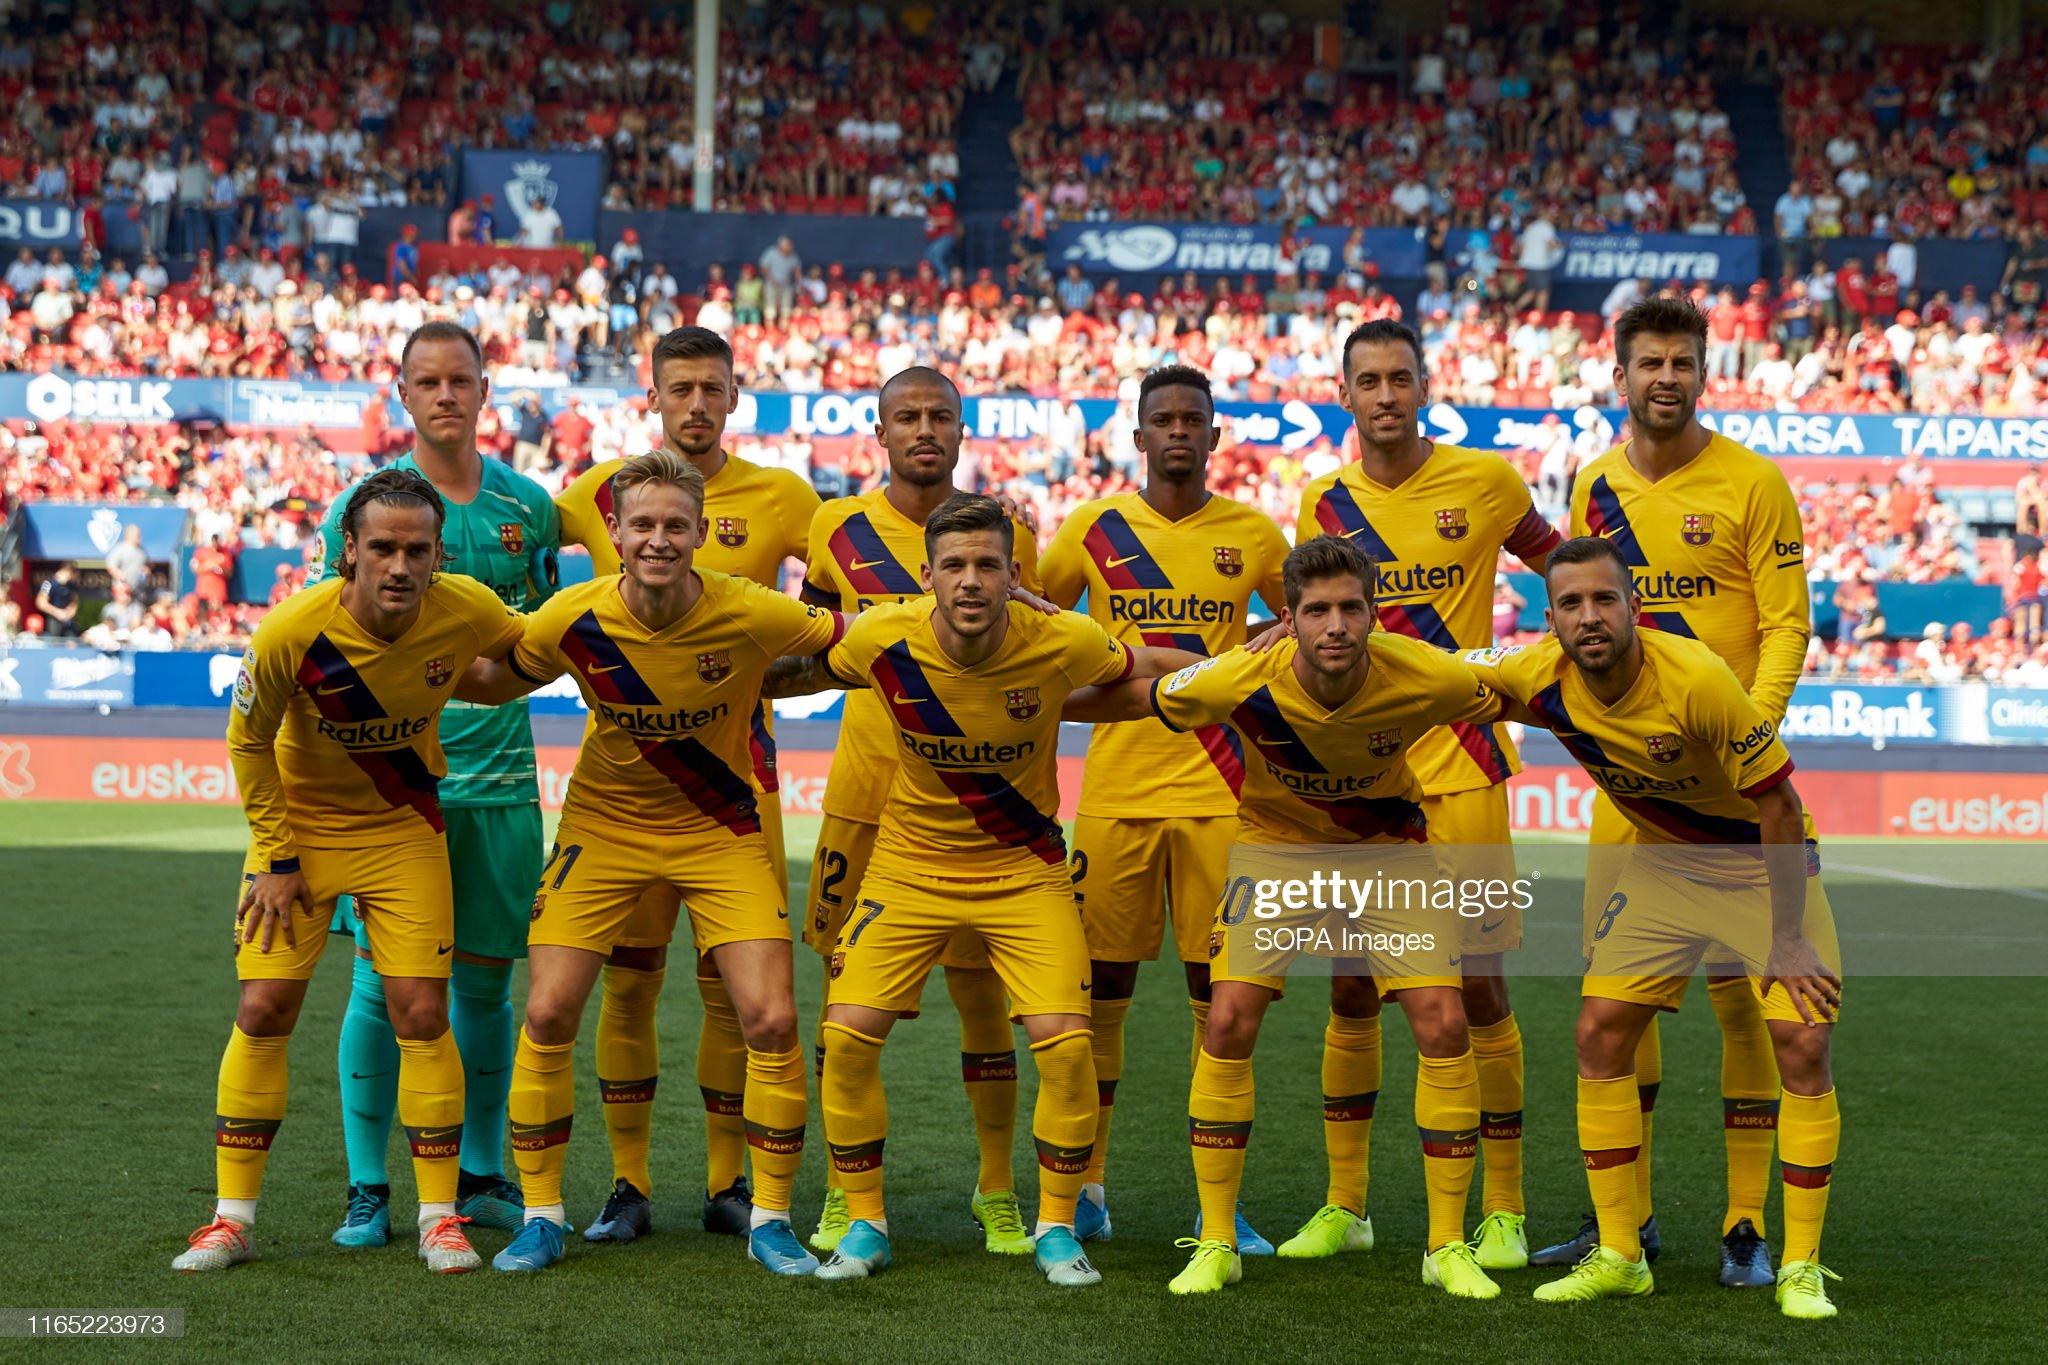 صور مباراة : أوساسونا - برشلونة 2-2 ( 31-08-2019 )  Titular-team-of-fc-barcelona-during-the-spanish-la-liga-santander-picture-id1165223973?s=2048x2048